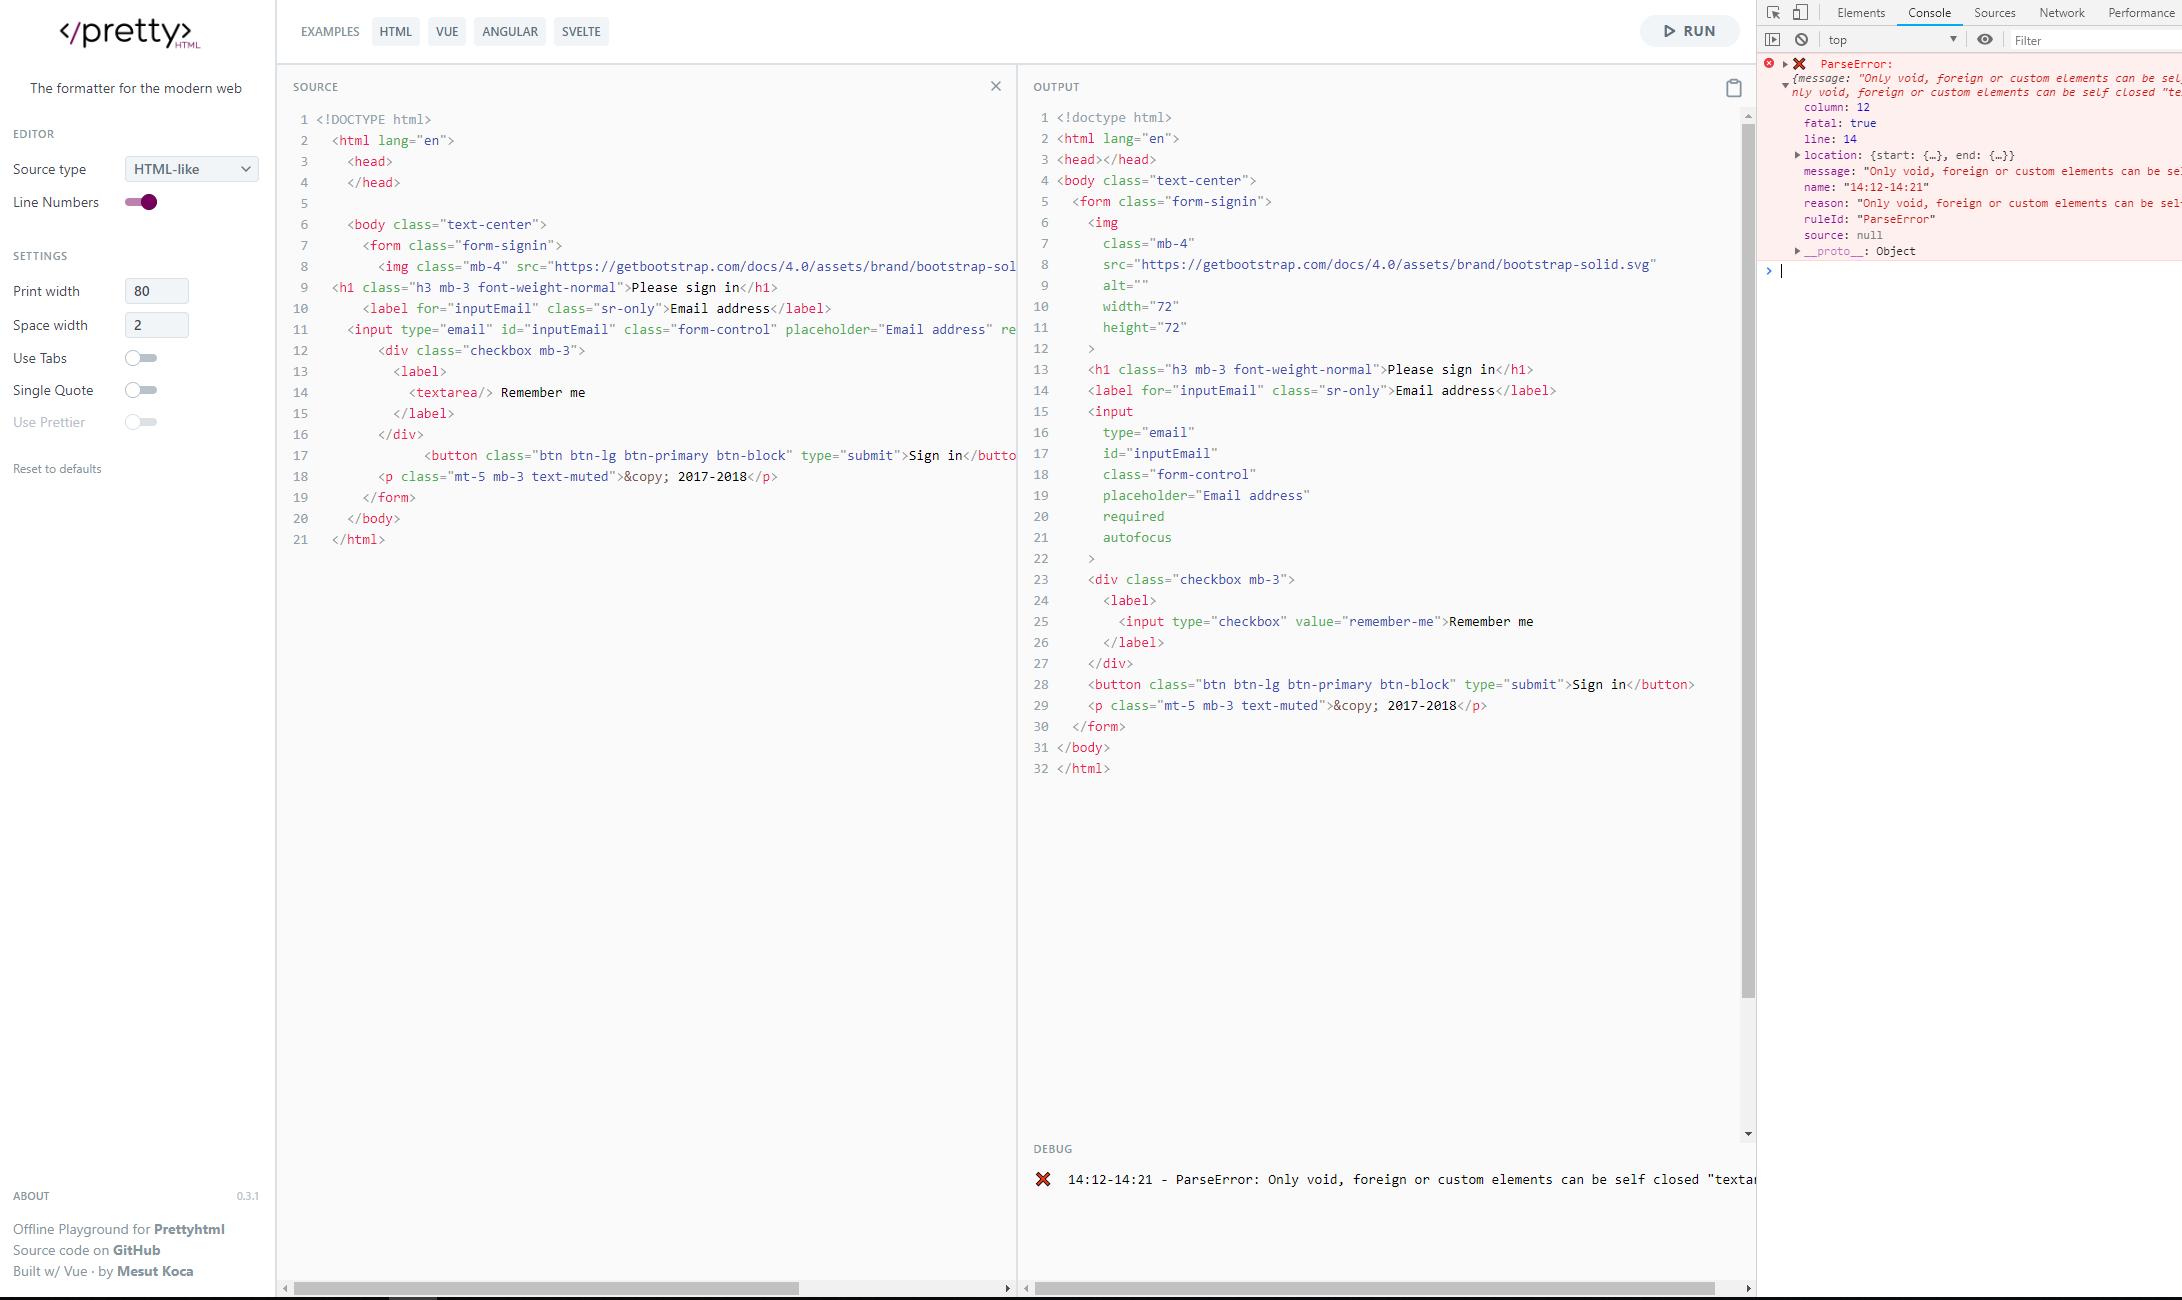 Display errors and warnings · Issue #7 · Prettyhtml/pretty-html-web